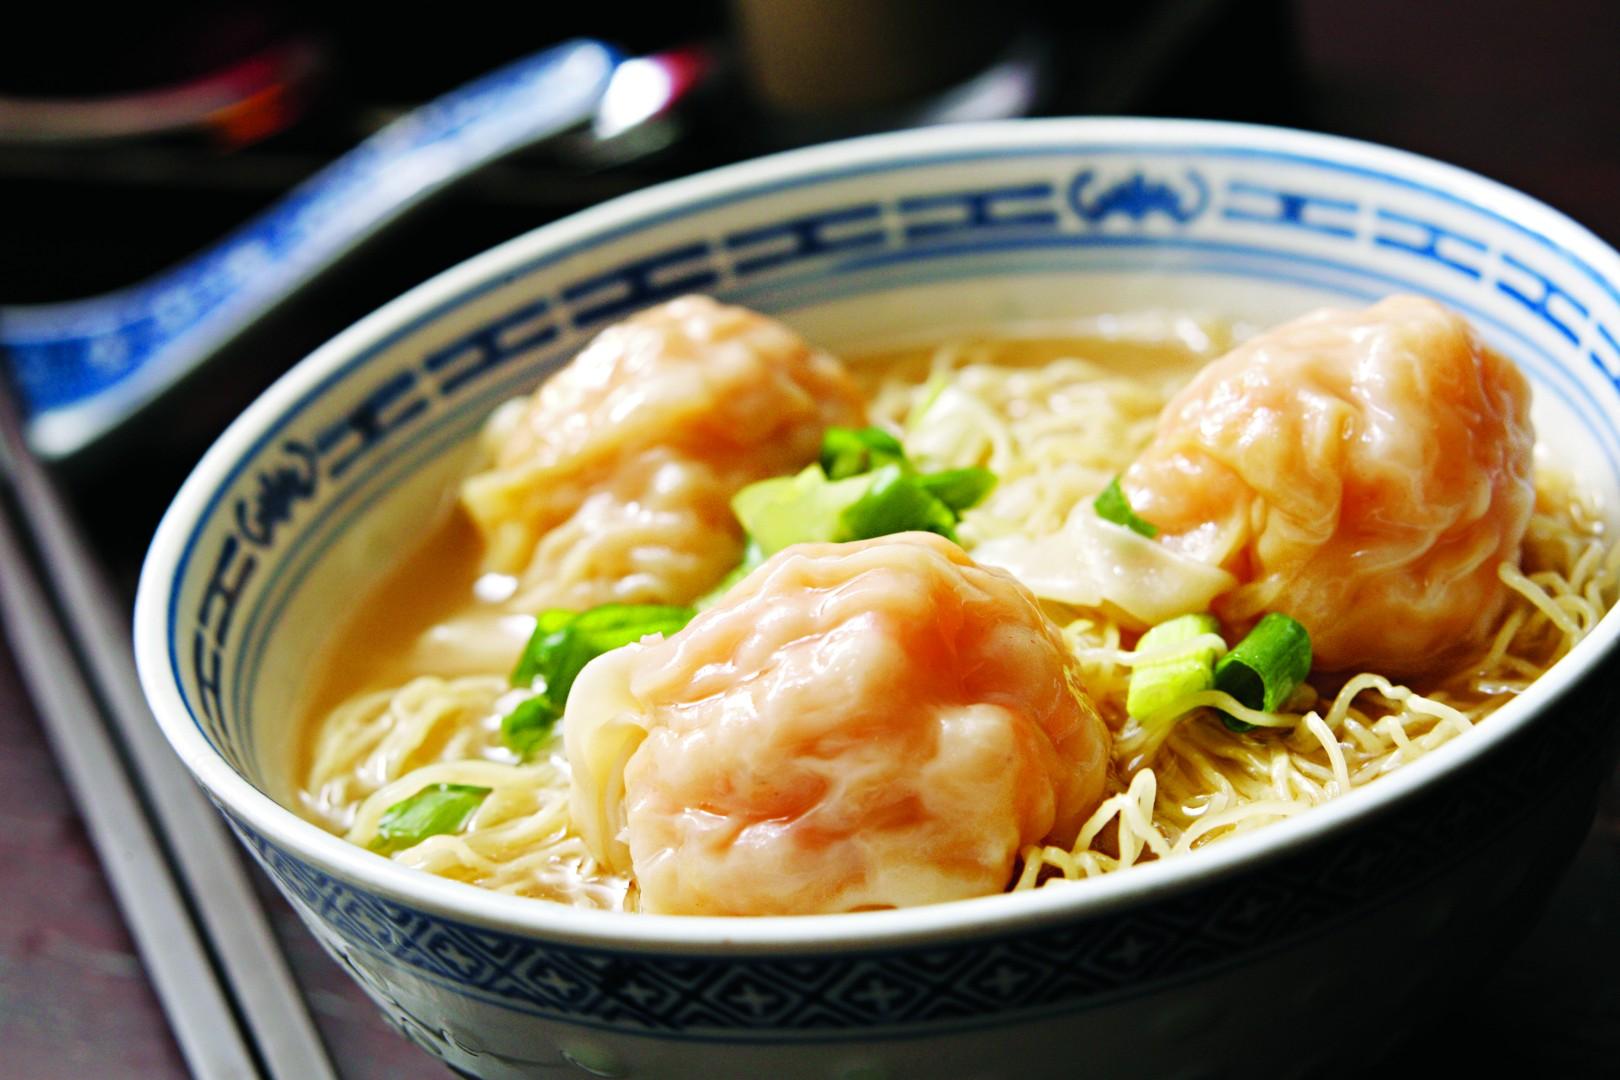 Hong Kong's 7 best wonton noodle restaurants | South China